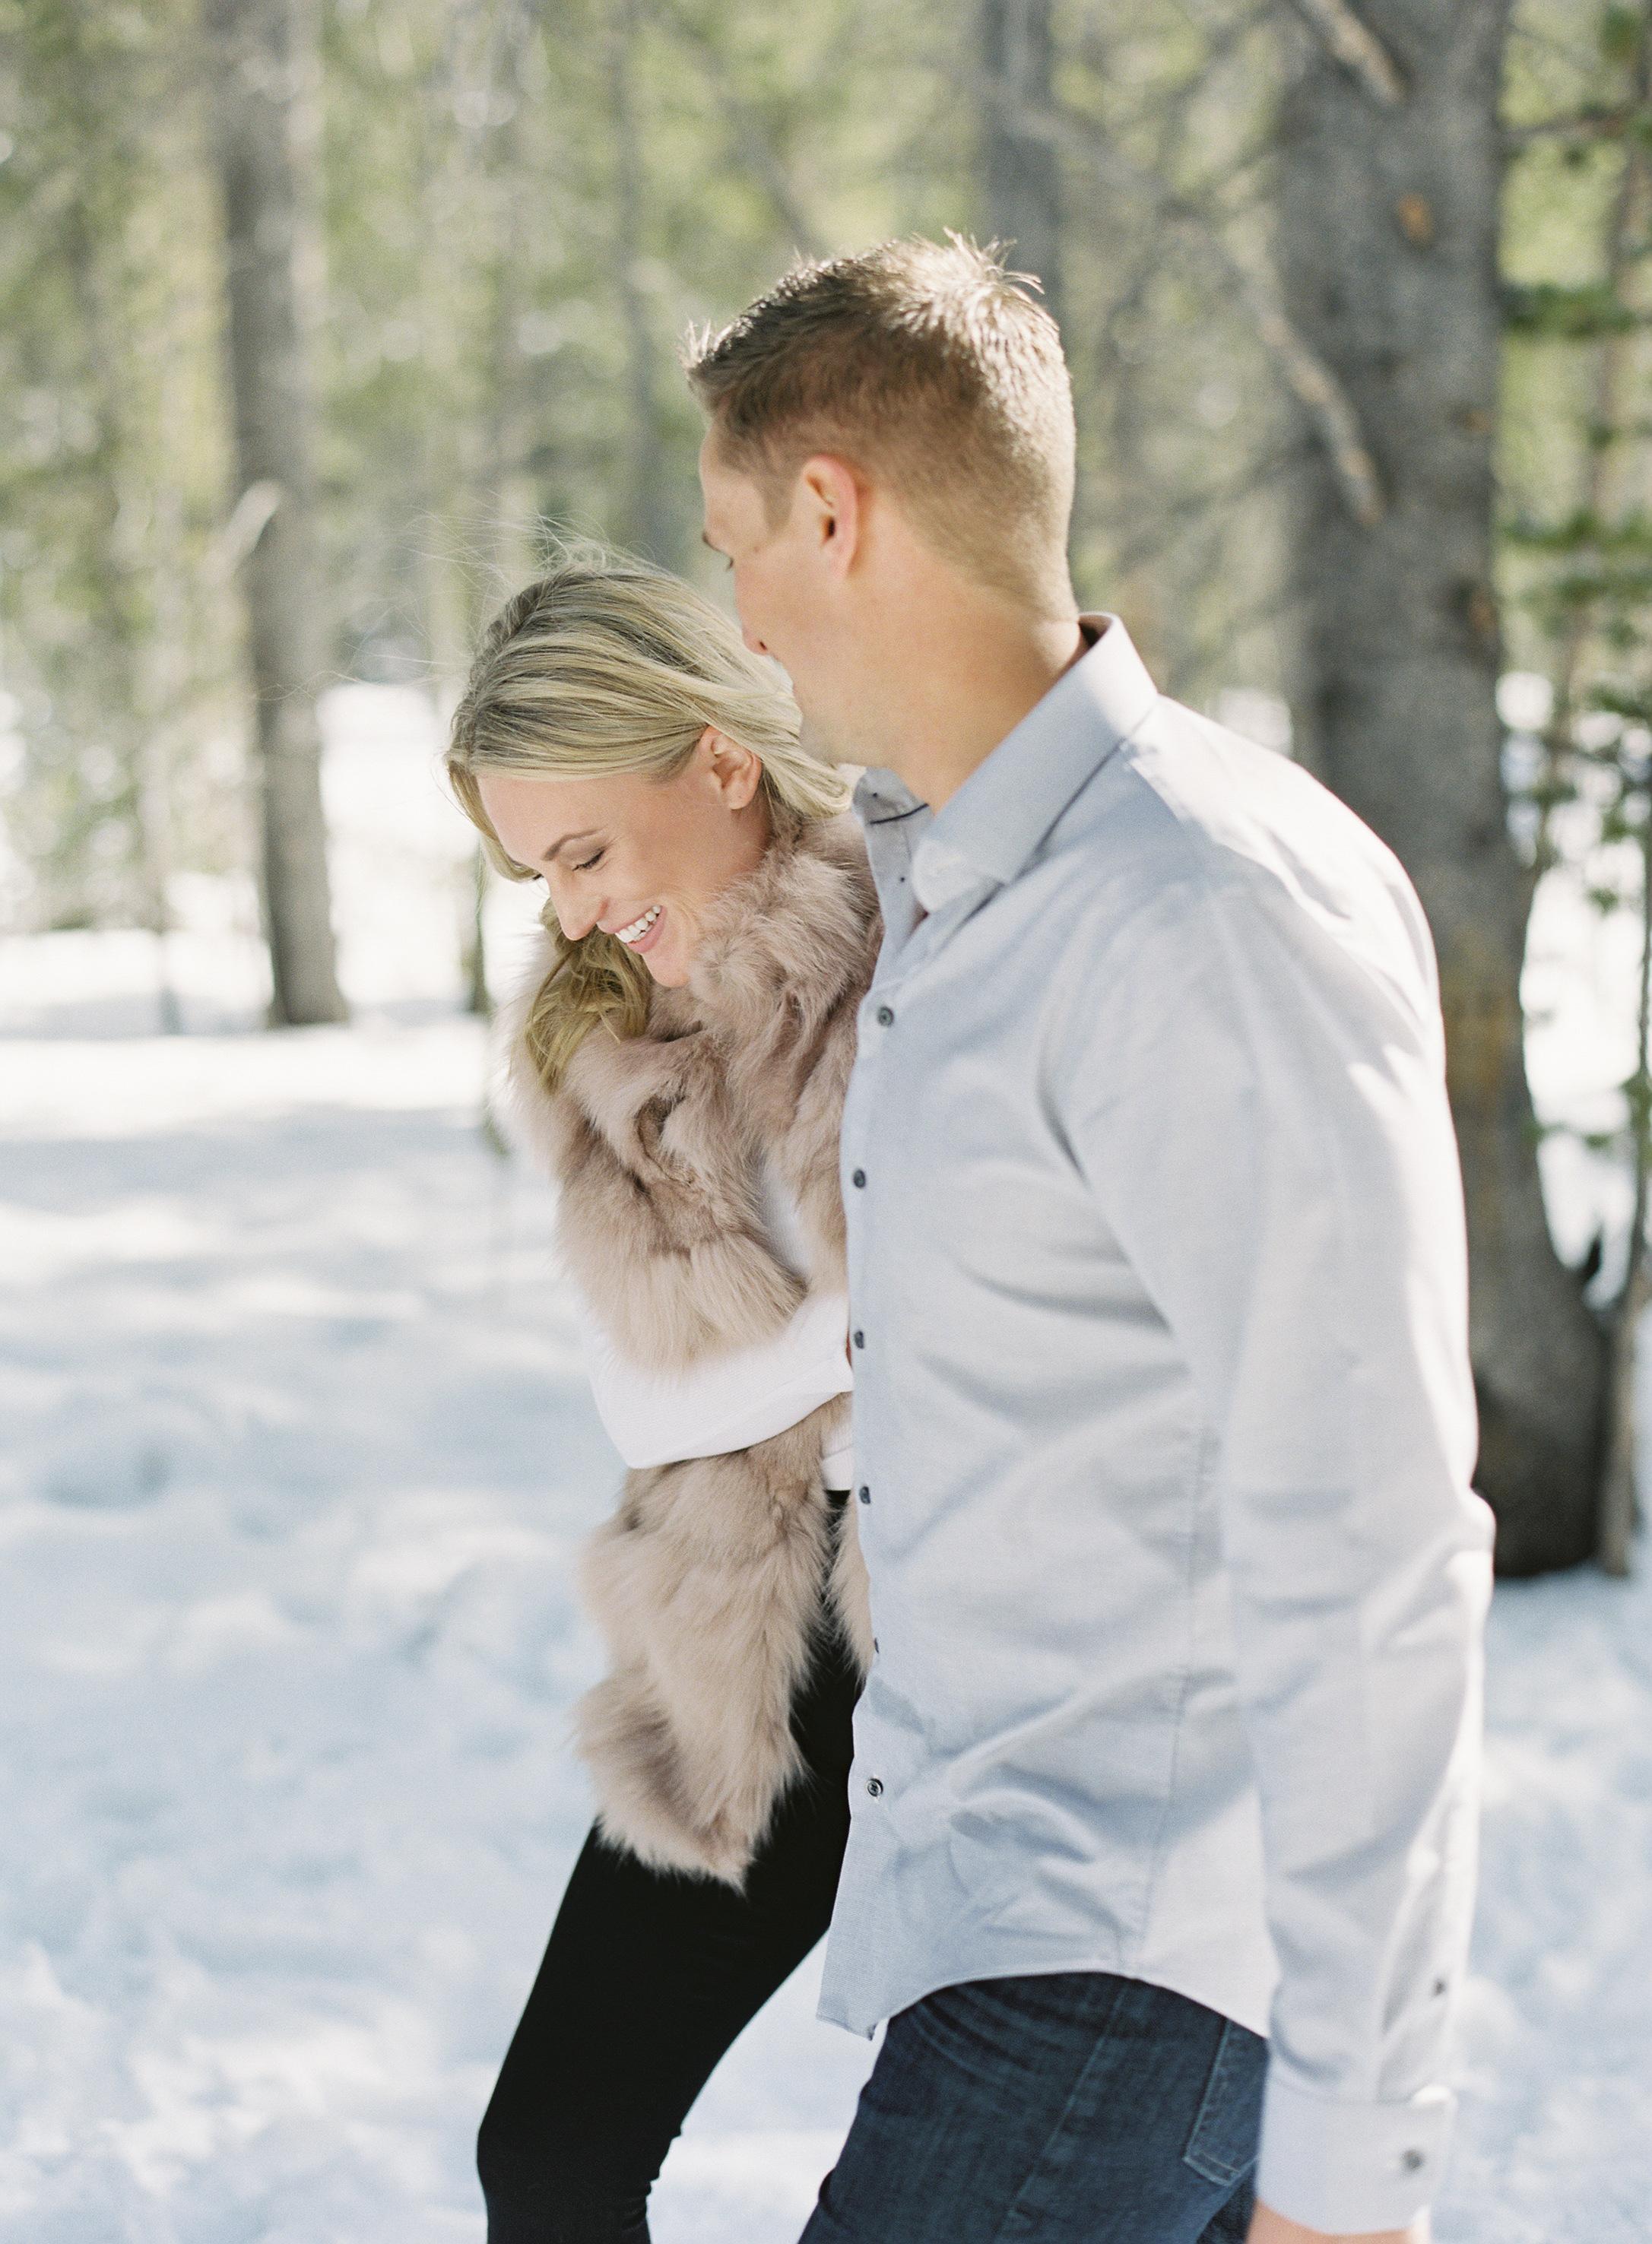 Sarah and John Engaged-Carrie King Photographer1.jpg